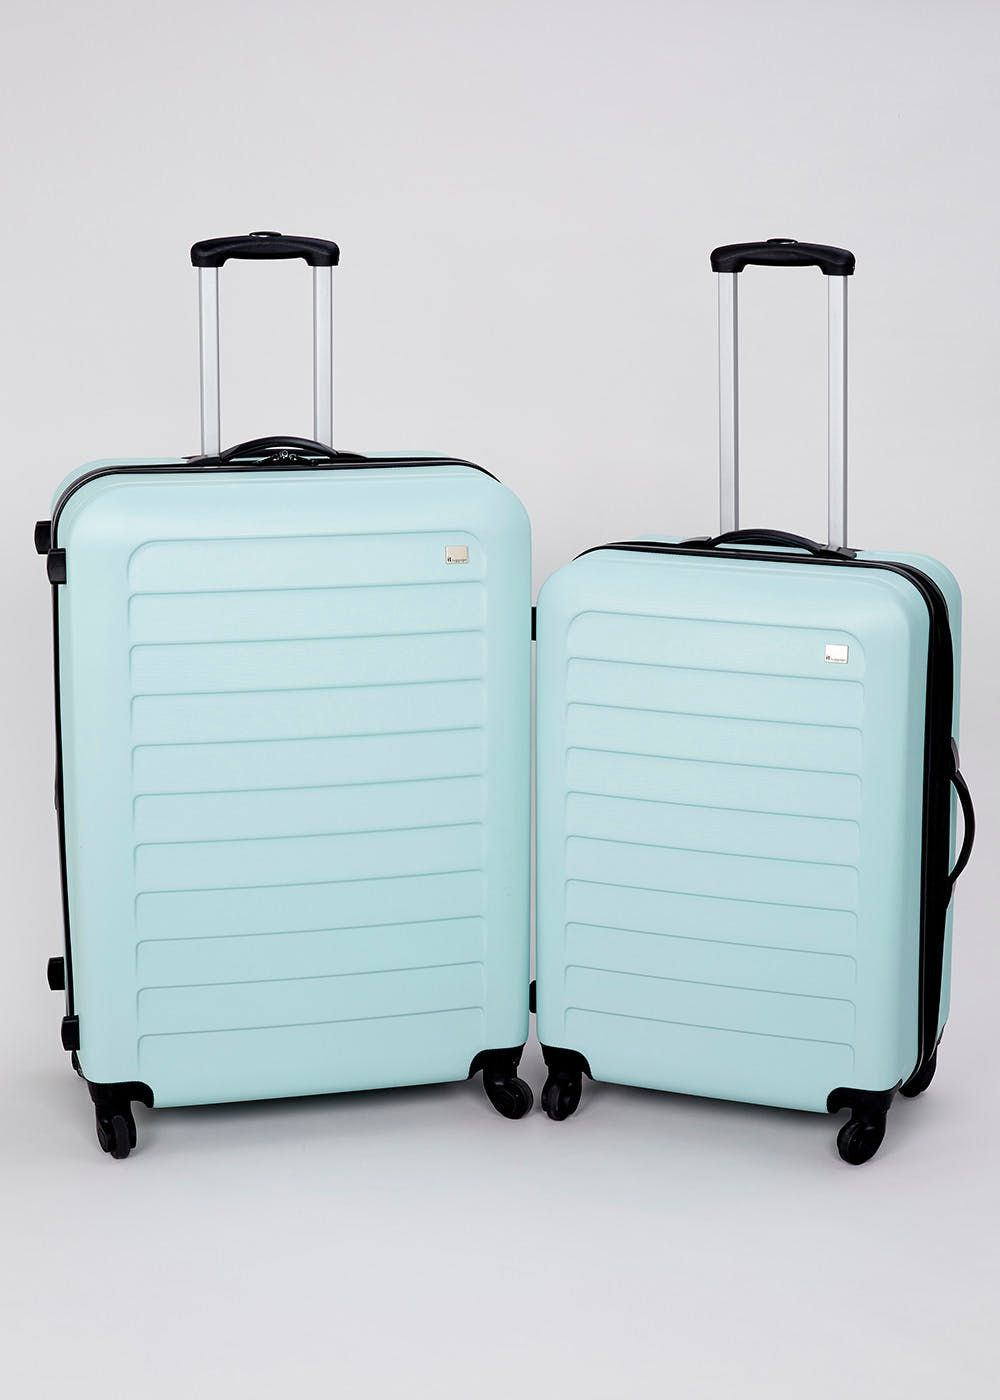 Leather Accent Tag - Shells Travel Luggage Tag by VIDA VIDA V5hzQjjQaK